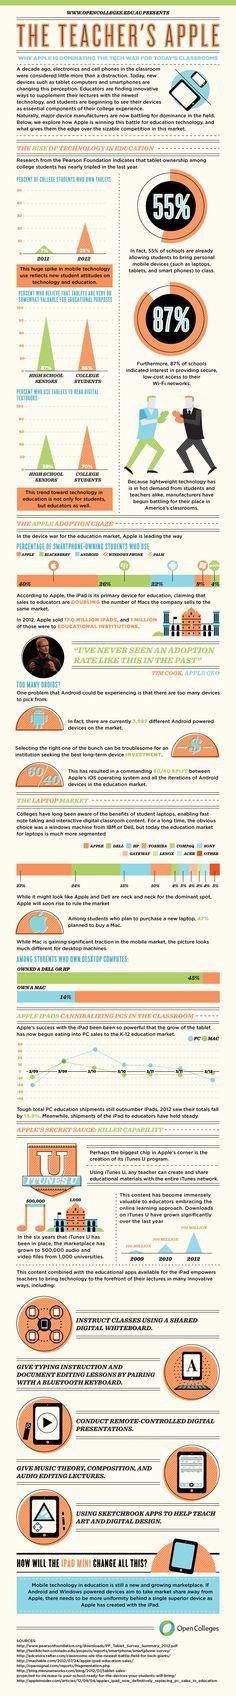 El profesor Apple #infografia #infographic #apple #education